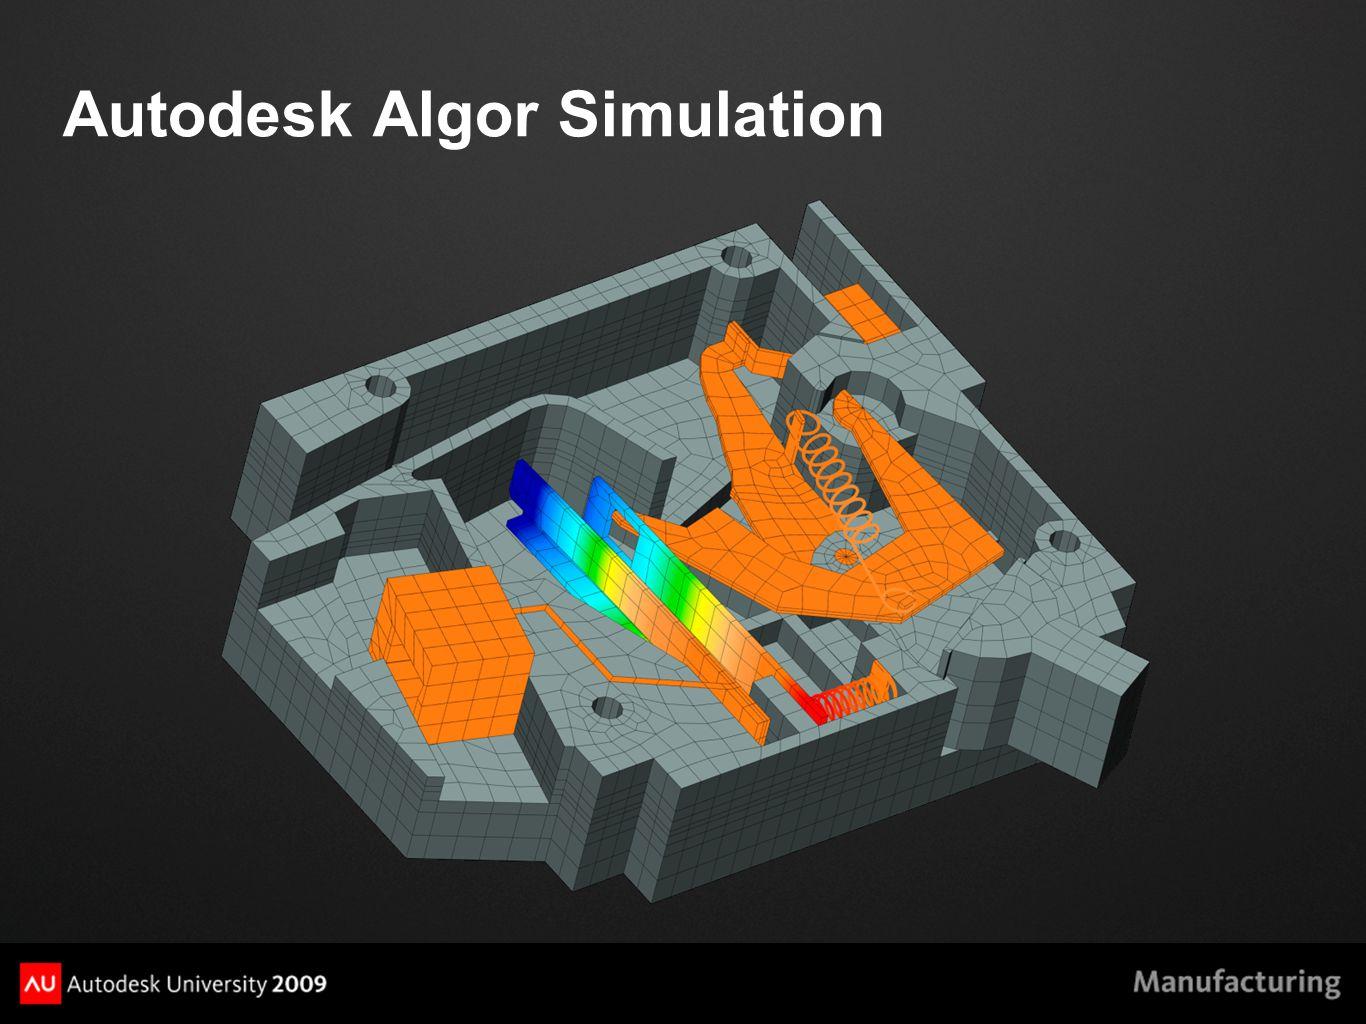 Autodesk Algor Simulation